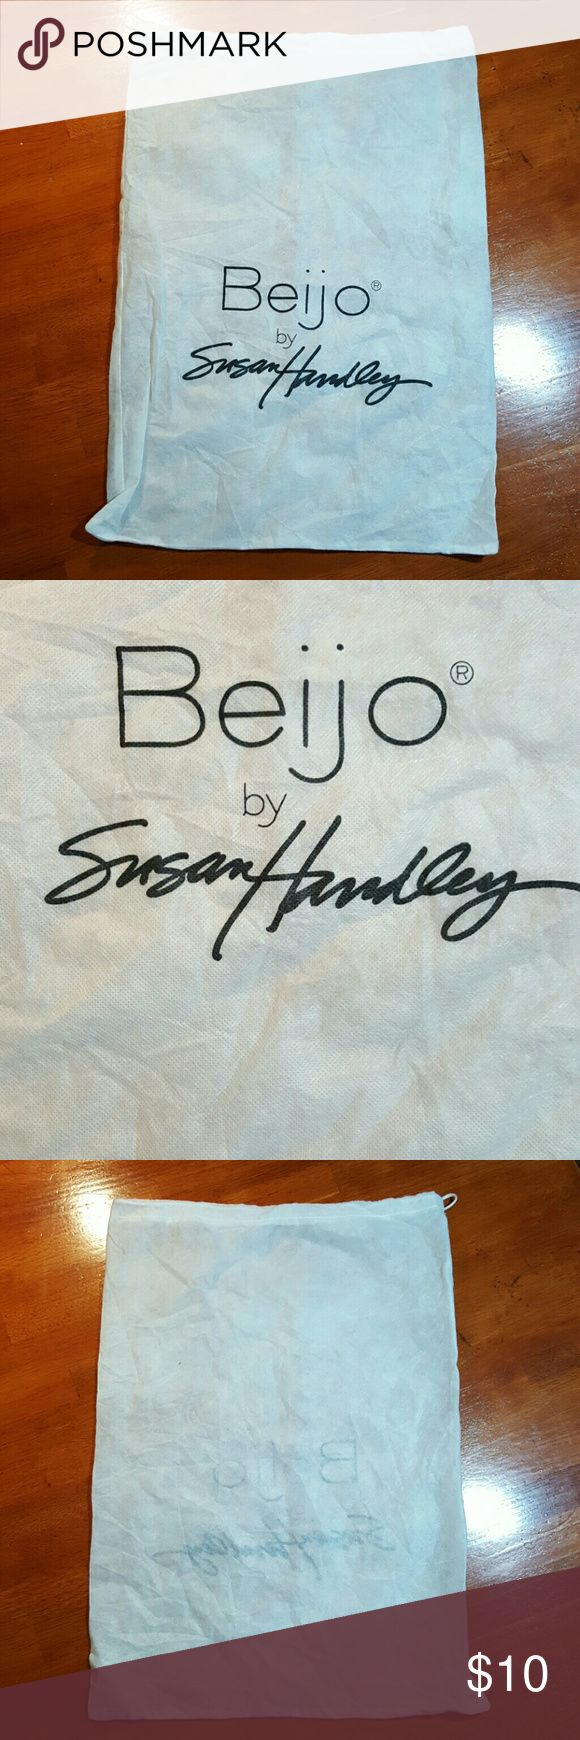 Bijo by susan handley dust bag White...black lettering..in great condition beijo Bags